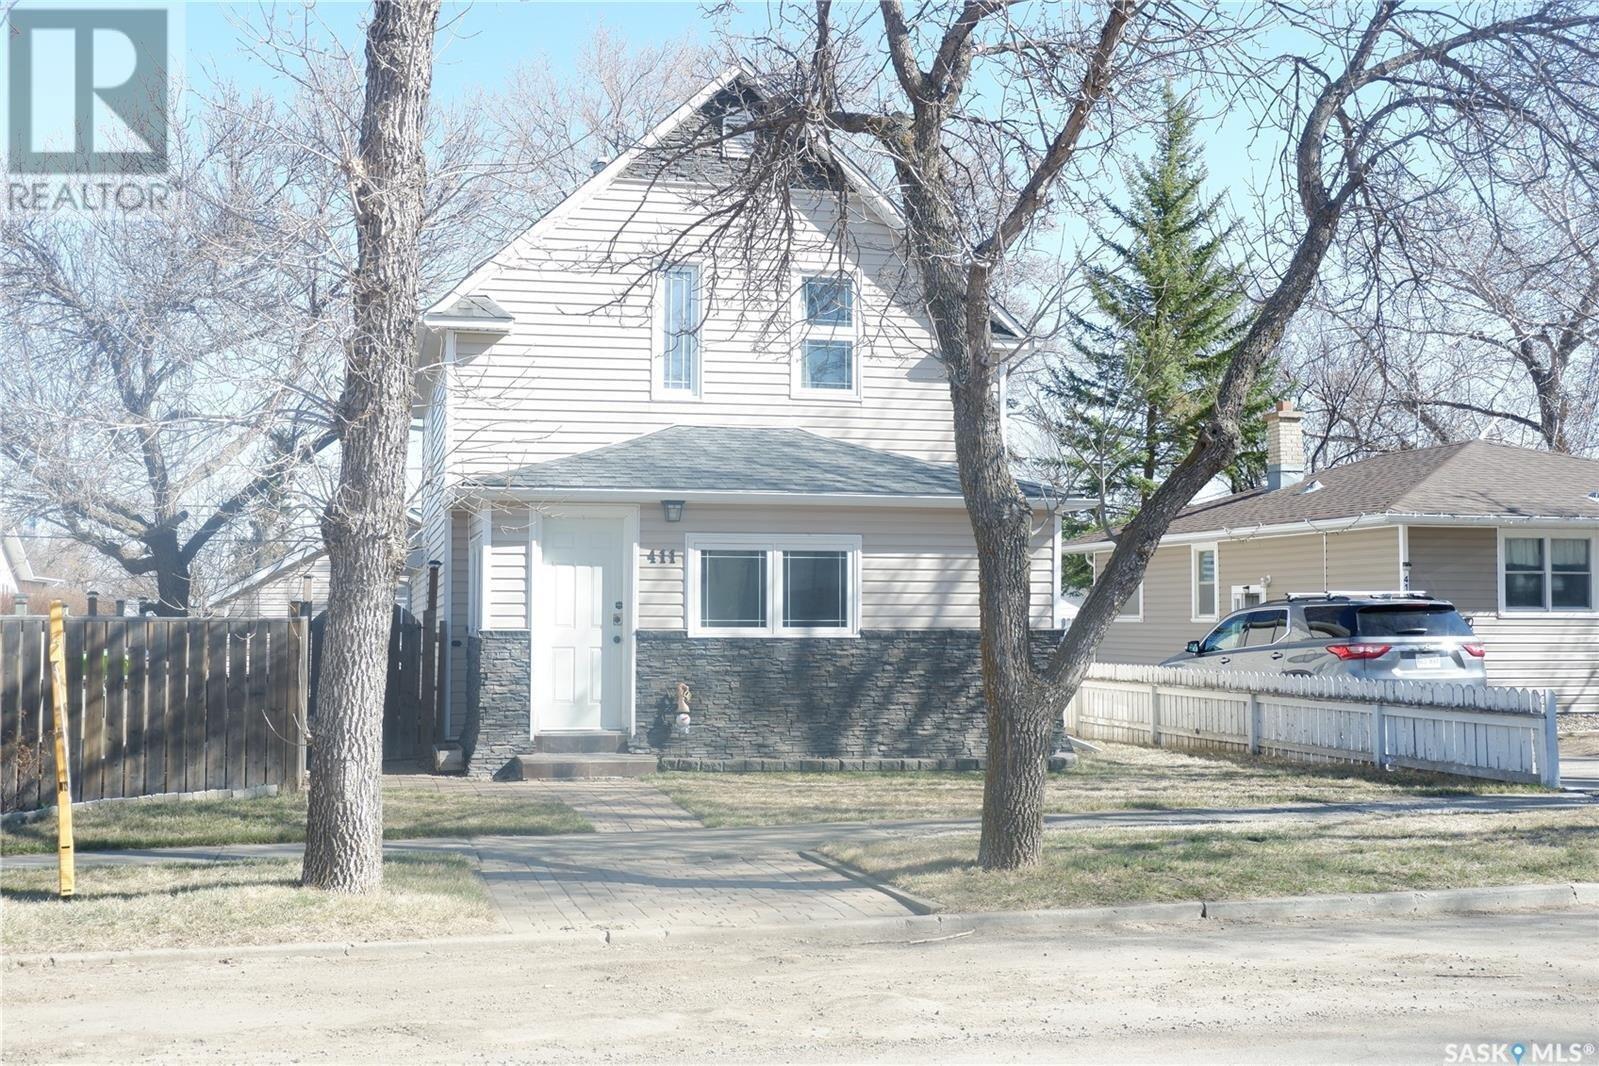 House for sale at 411 4th Ave E Assiniboia Saskatchewan - MLS: SK834426